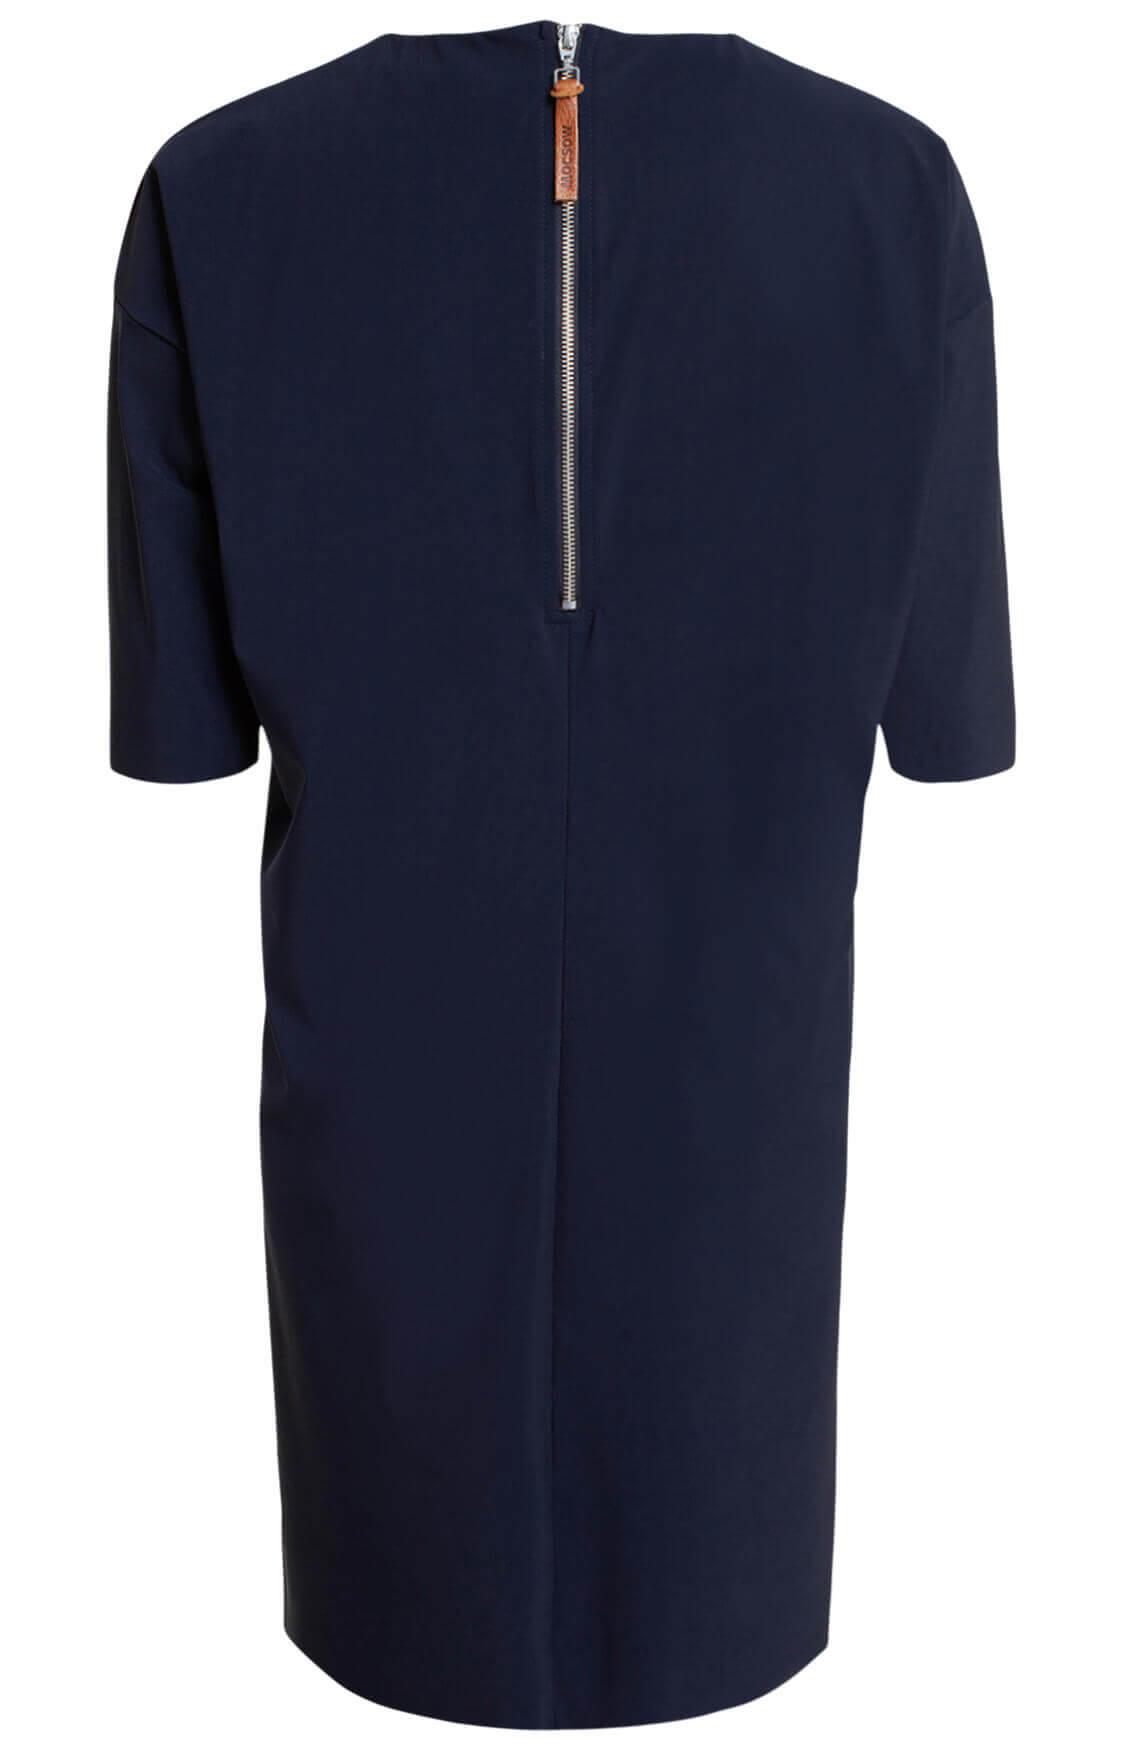 Moscow Dames Diana jurk Blauw